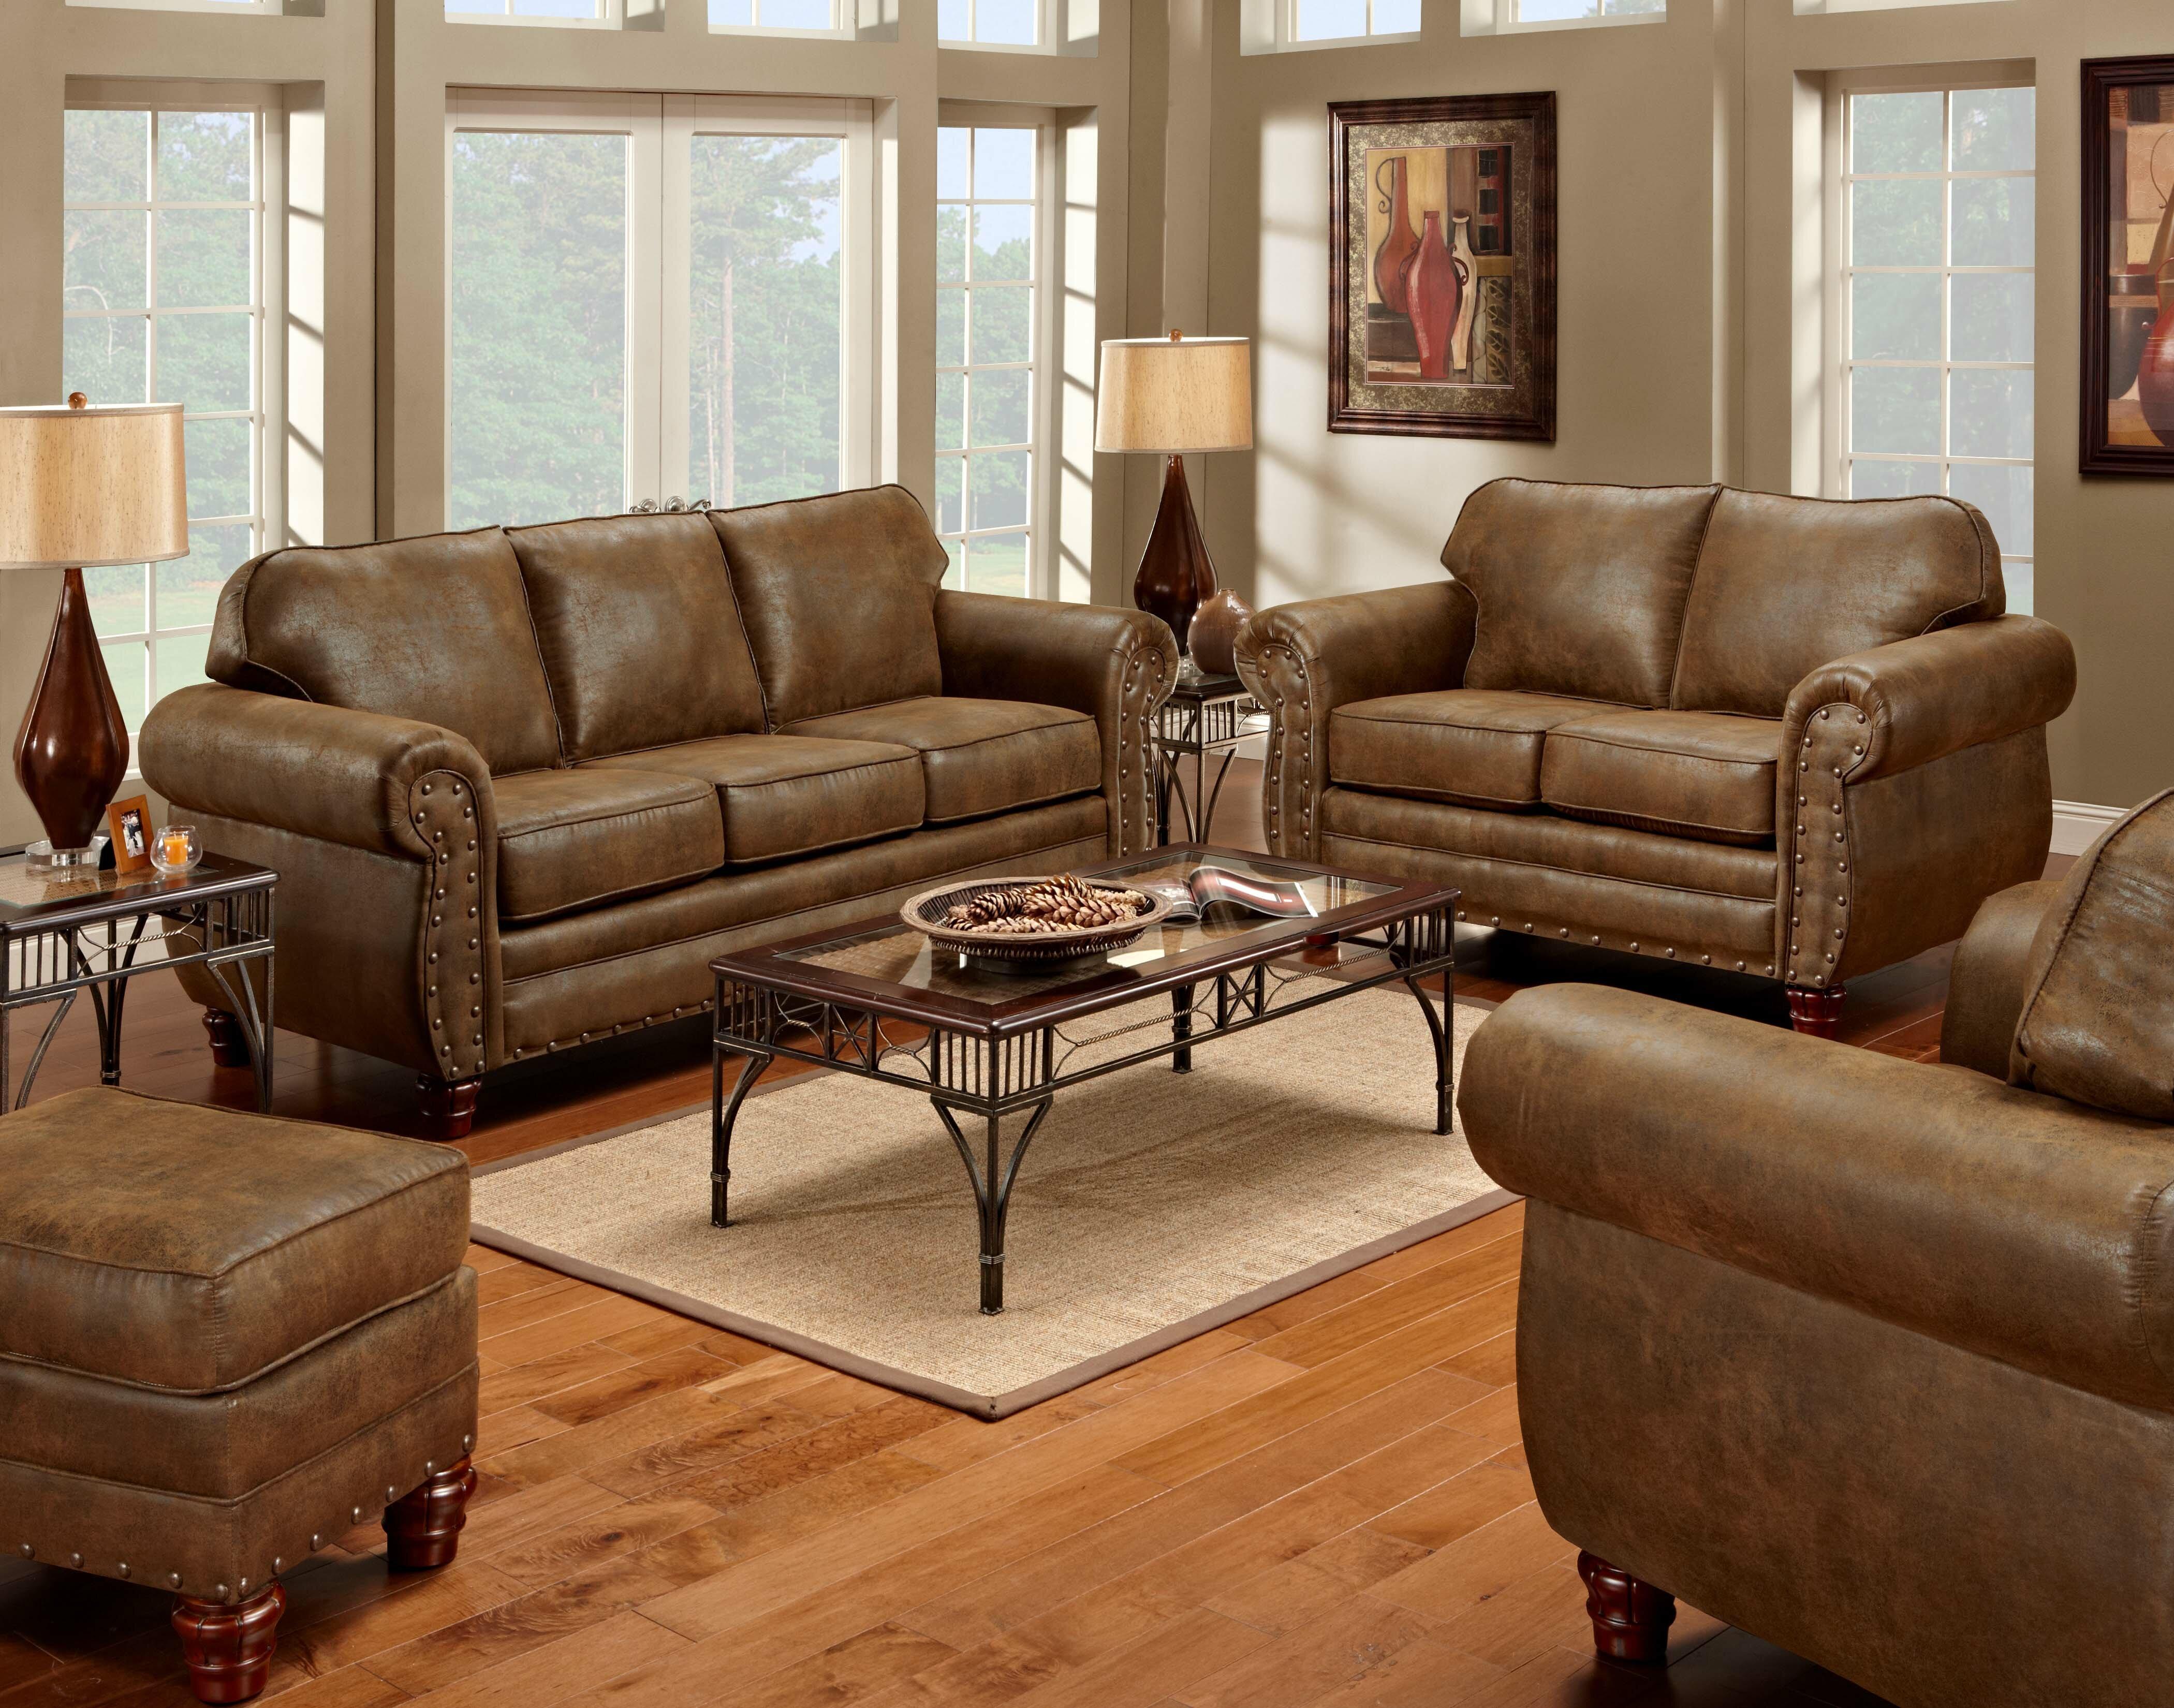 American Furniture Classics Sedona 4 Piece Living Room Set & Reviews ...